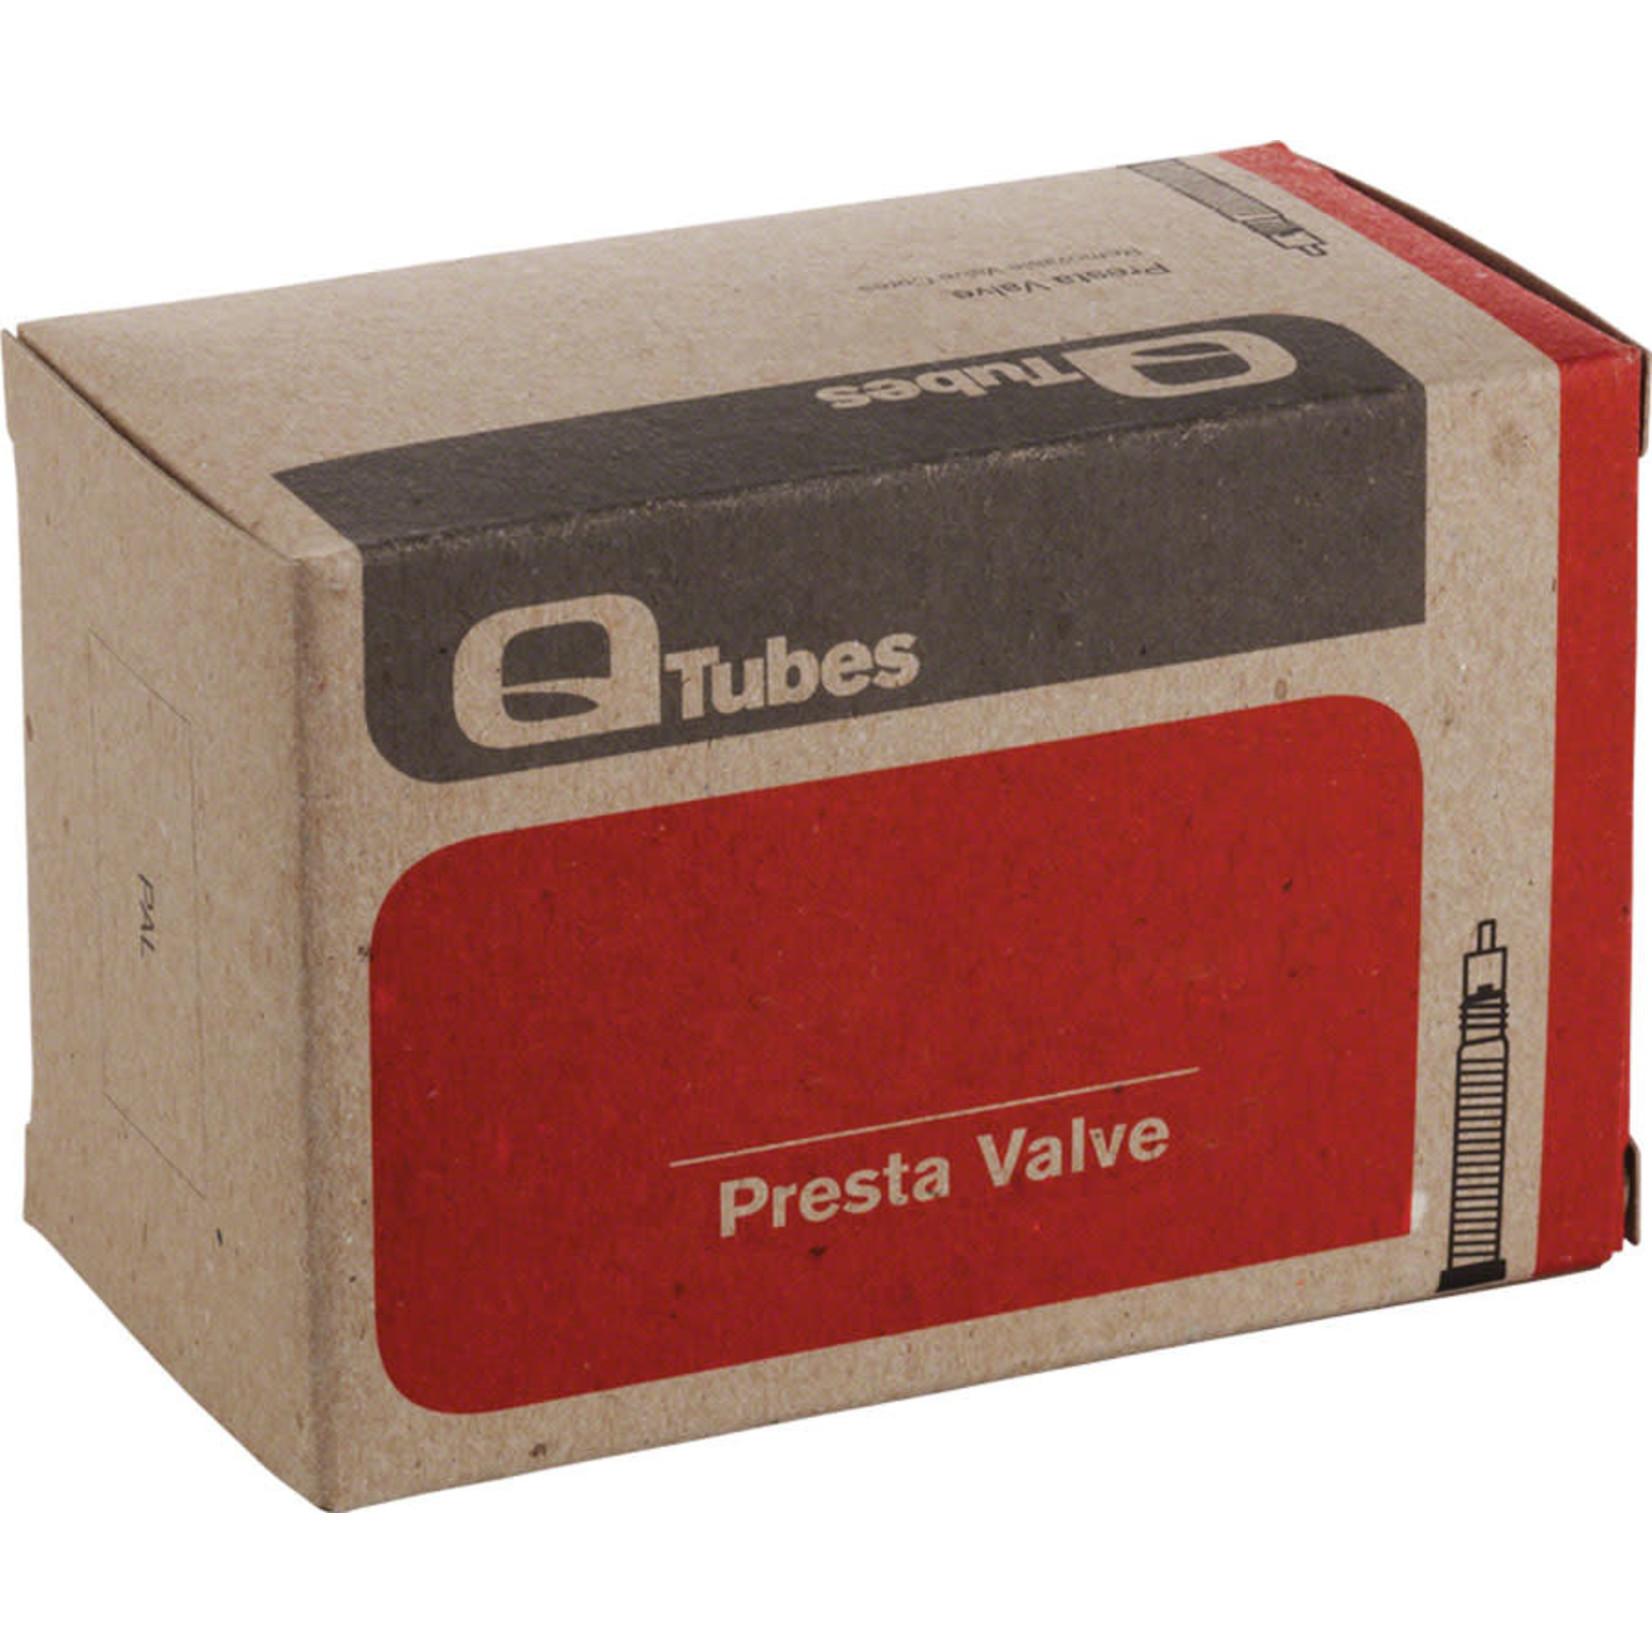 Q-Tubes Q-Tubes 700c x 40-45mm 48mm Presta Valve Tube